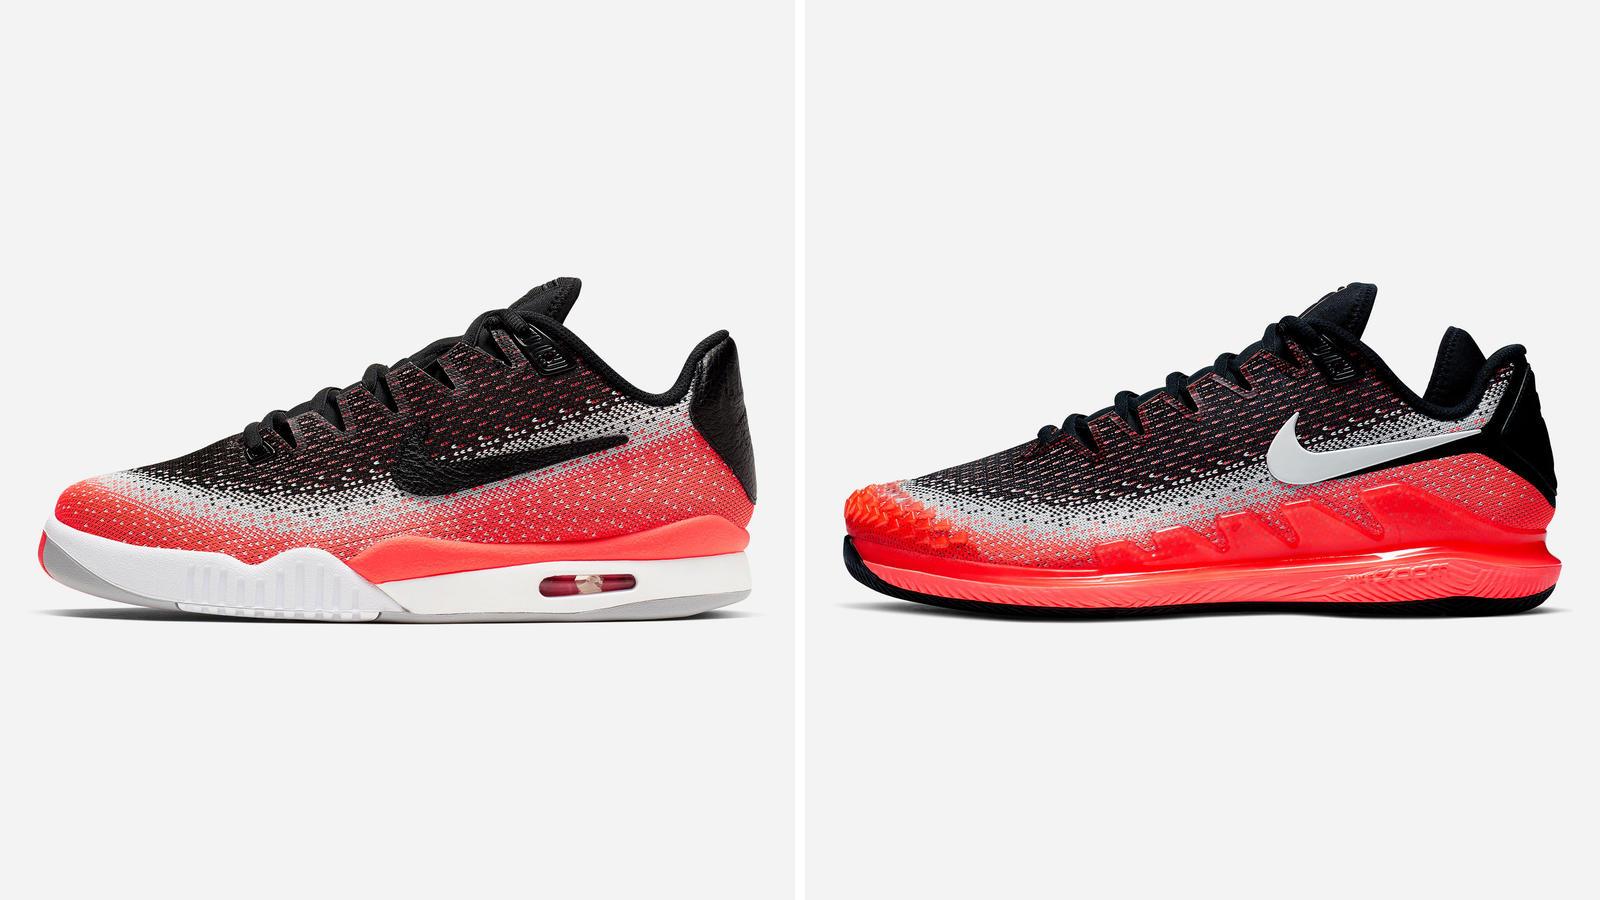 NikeCourt Vapor x TC Knit, NikeCourt Air Zoom Vapor x Knit